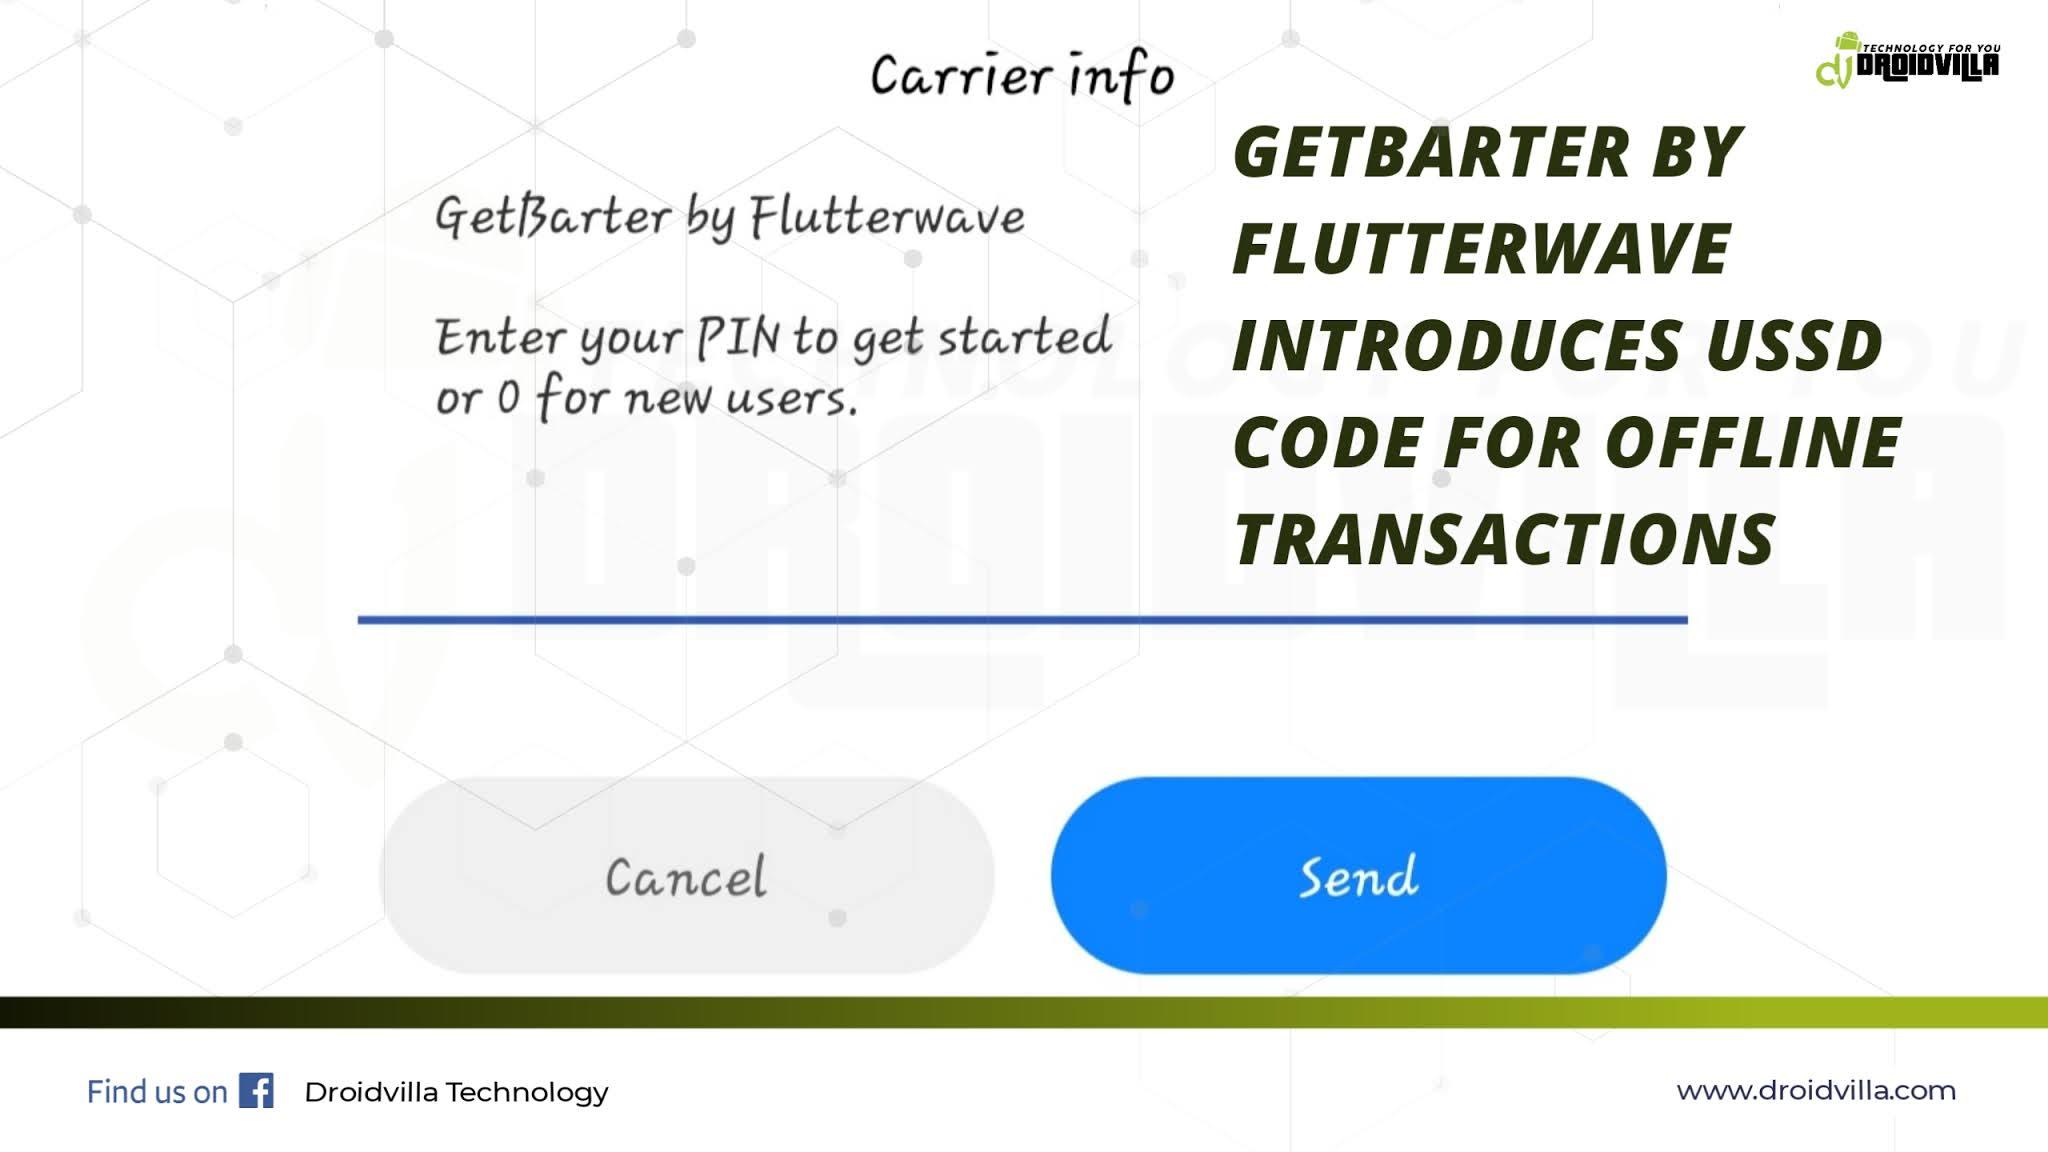 getbarter-by-flutterwave-introduces-ussd-code-for-offline-transactions-droidvilla-tech-1-android-tech-blog